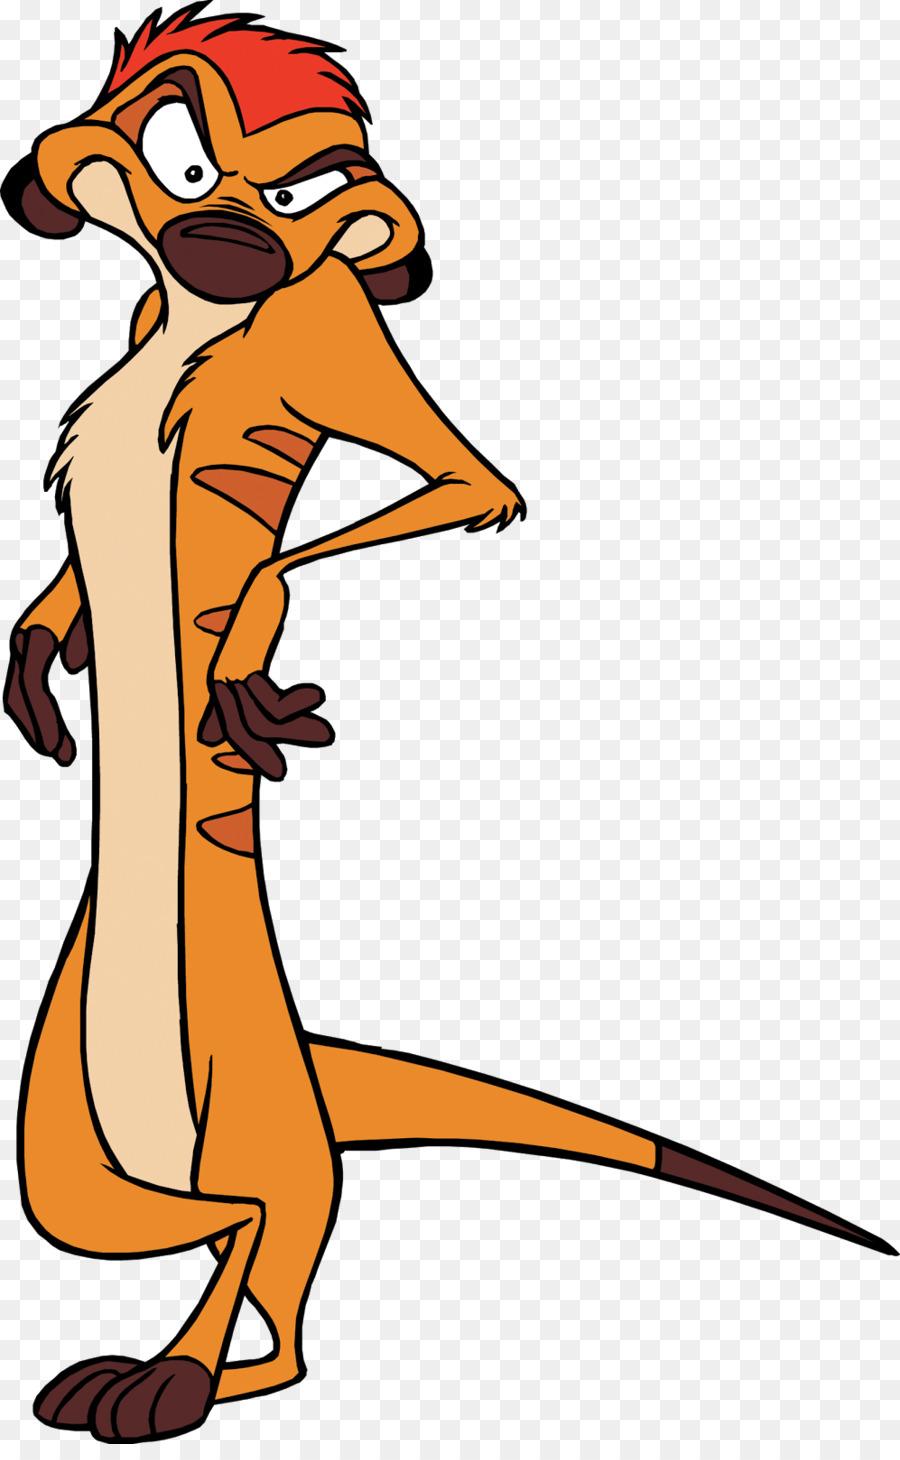 900x1460 Meerkat Timon And Pumbaa Clip Art